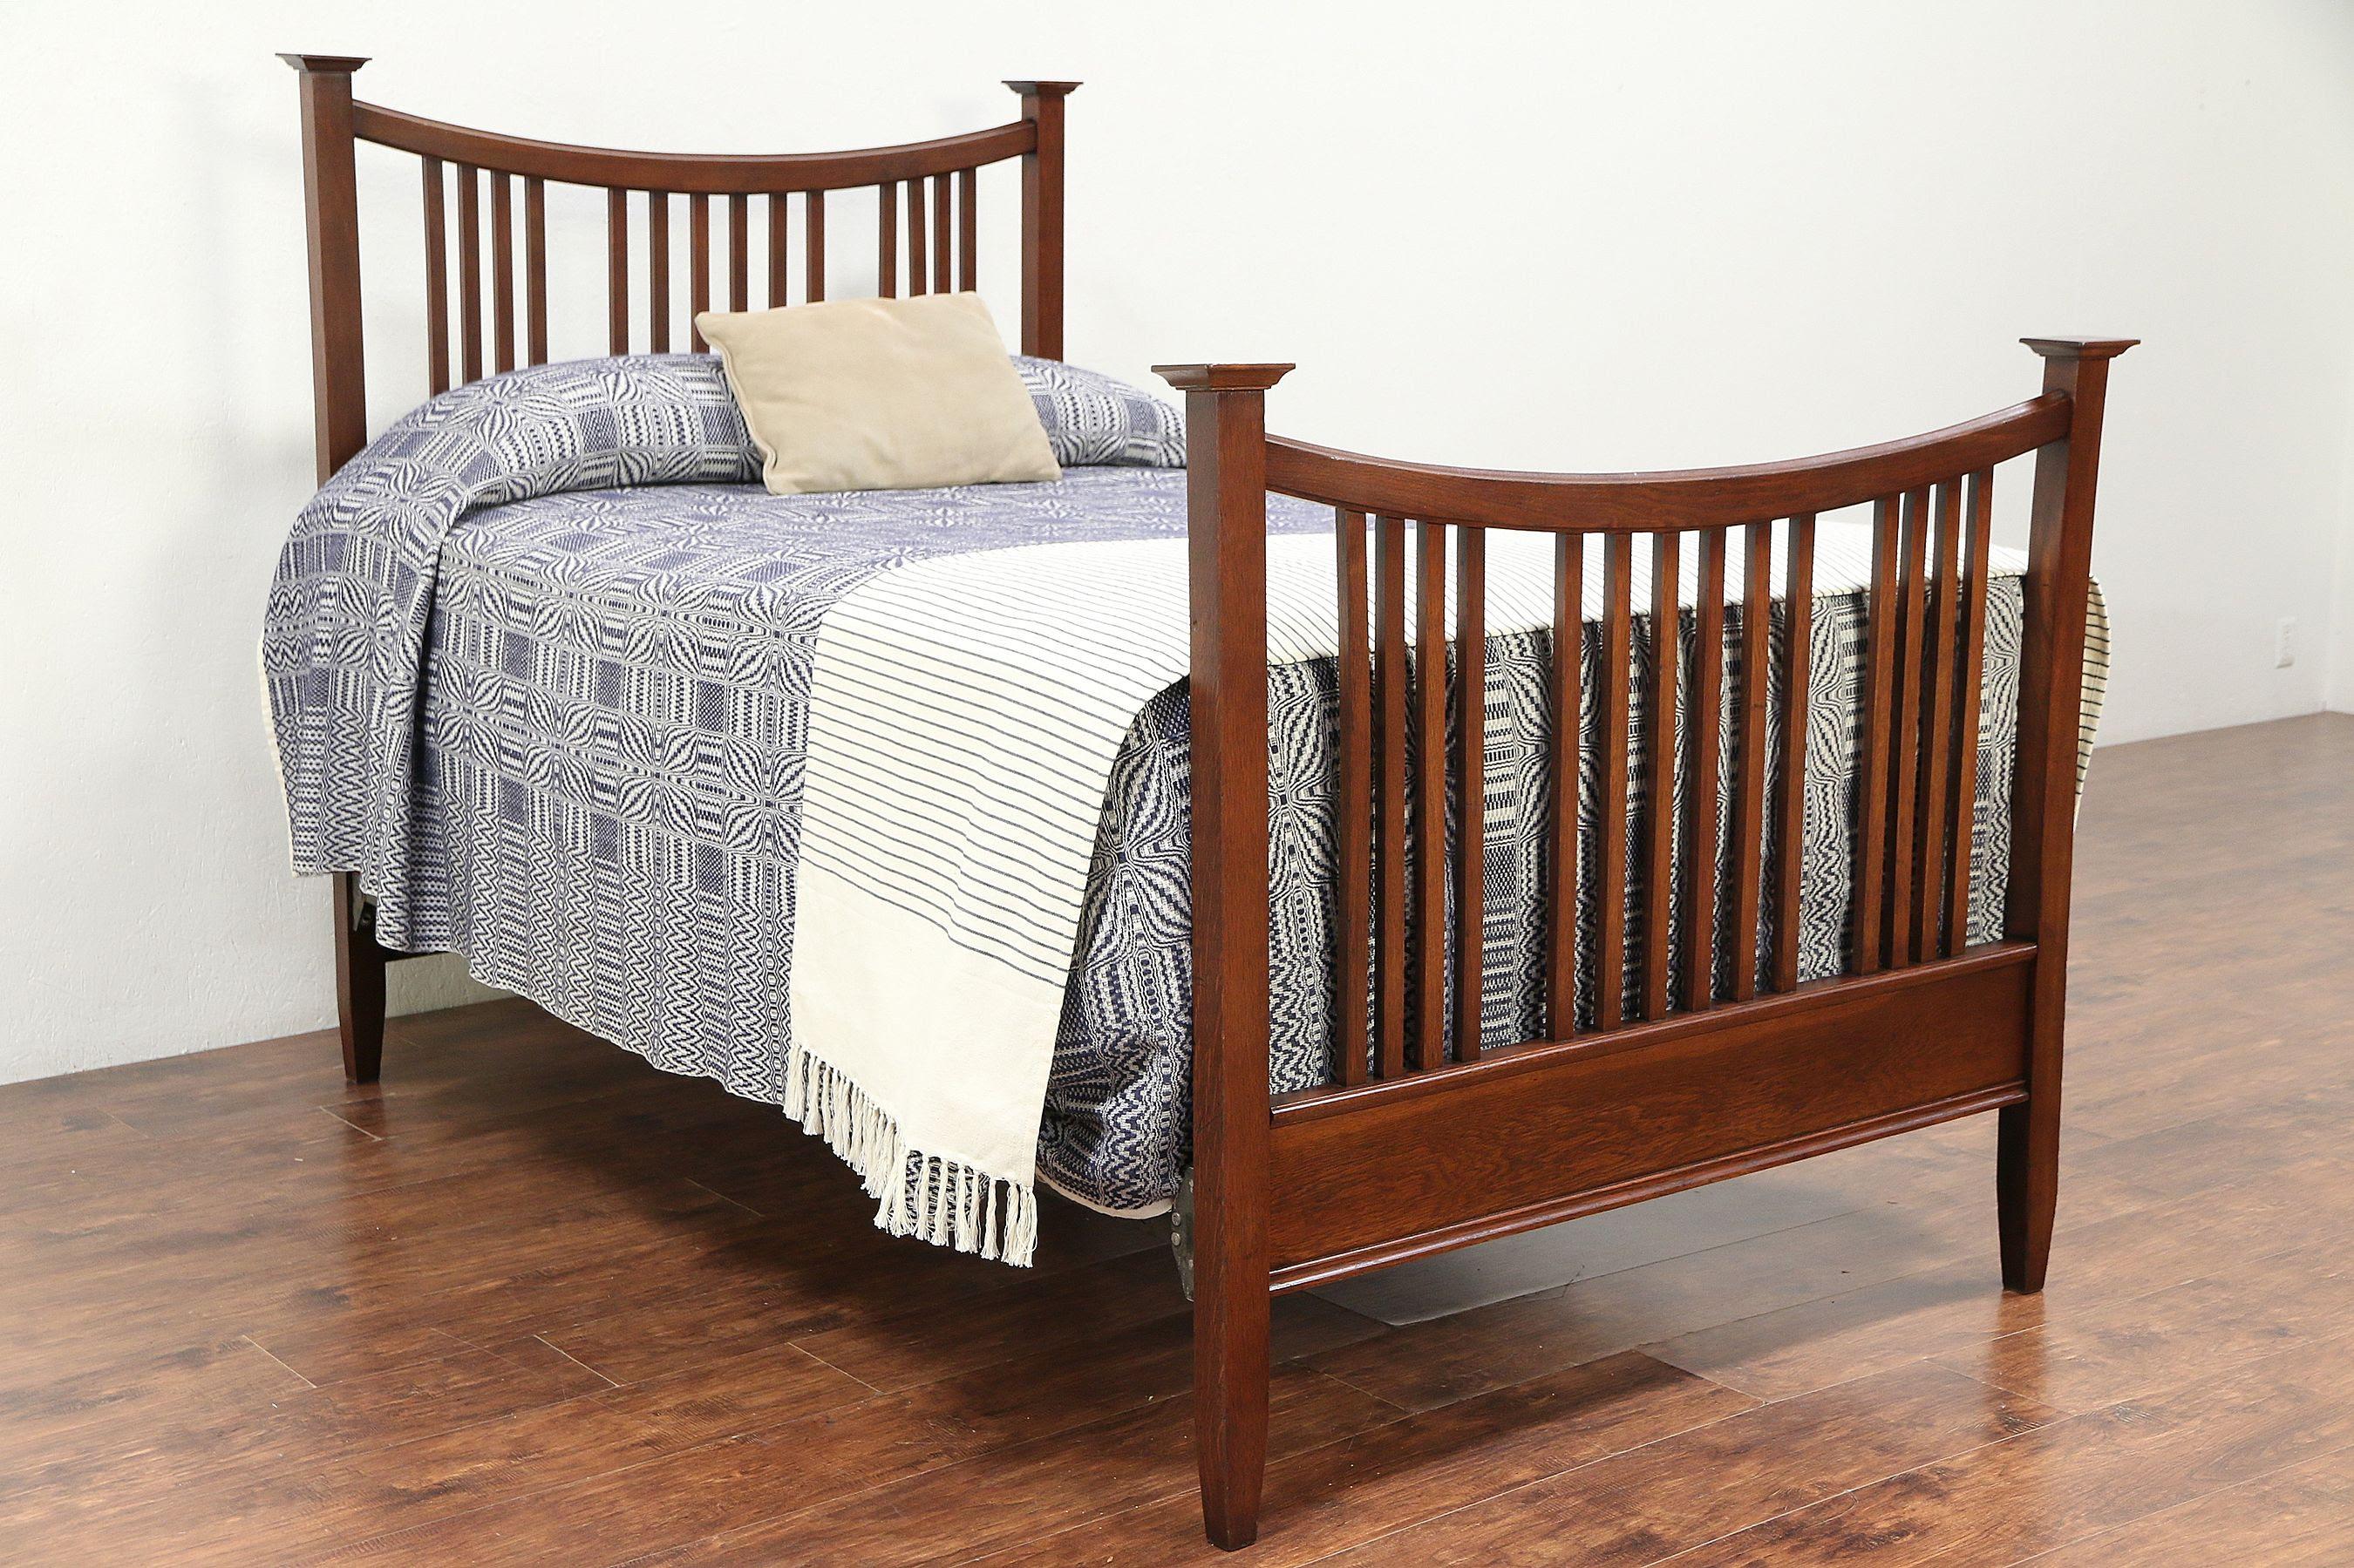 Sold Arts Crafts Mission Oak Full Size Antique 1905 Craftsman Bed 29293 Harp Gallery Antiques Furniture